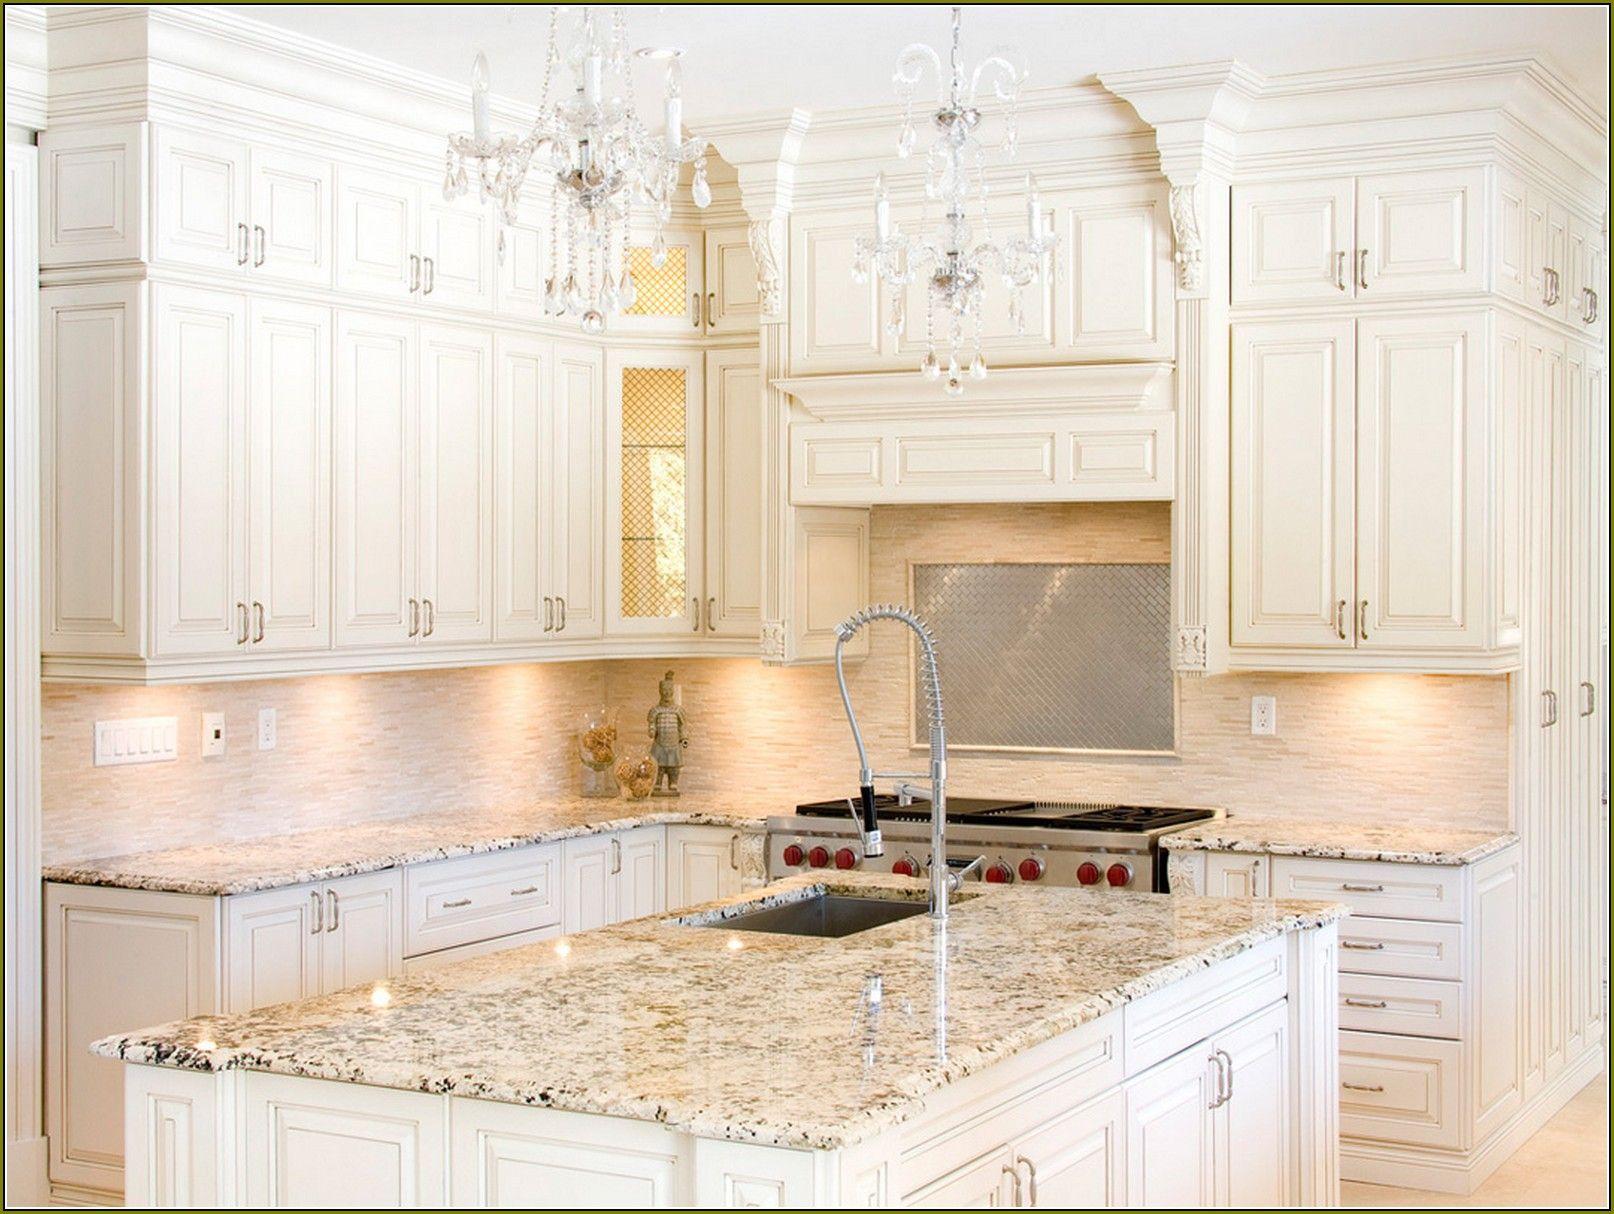 Off White Kitchen With Granite Countertops